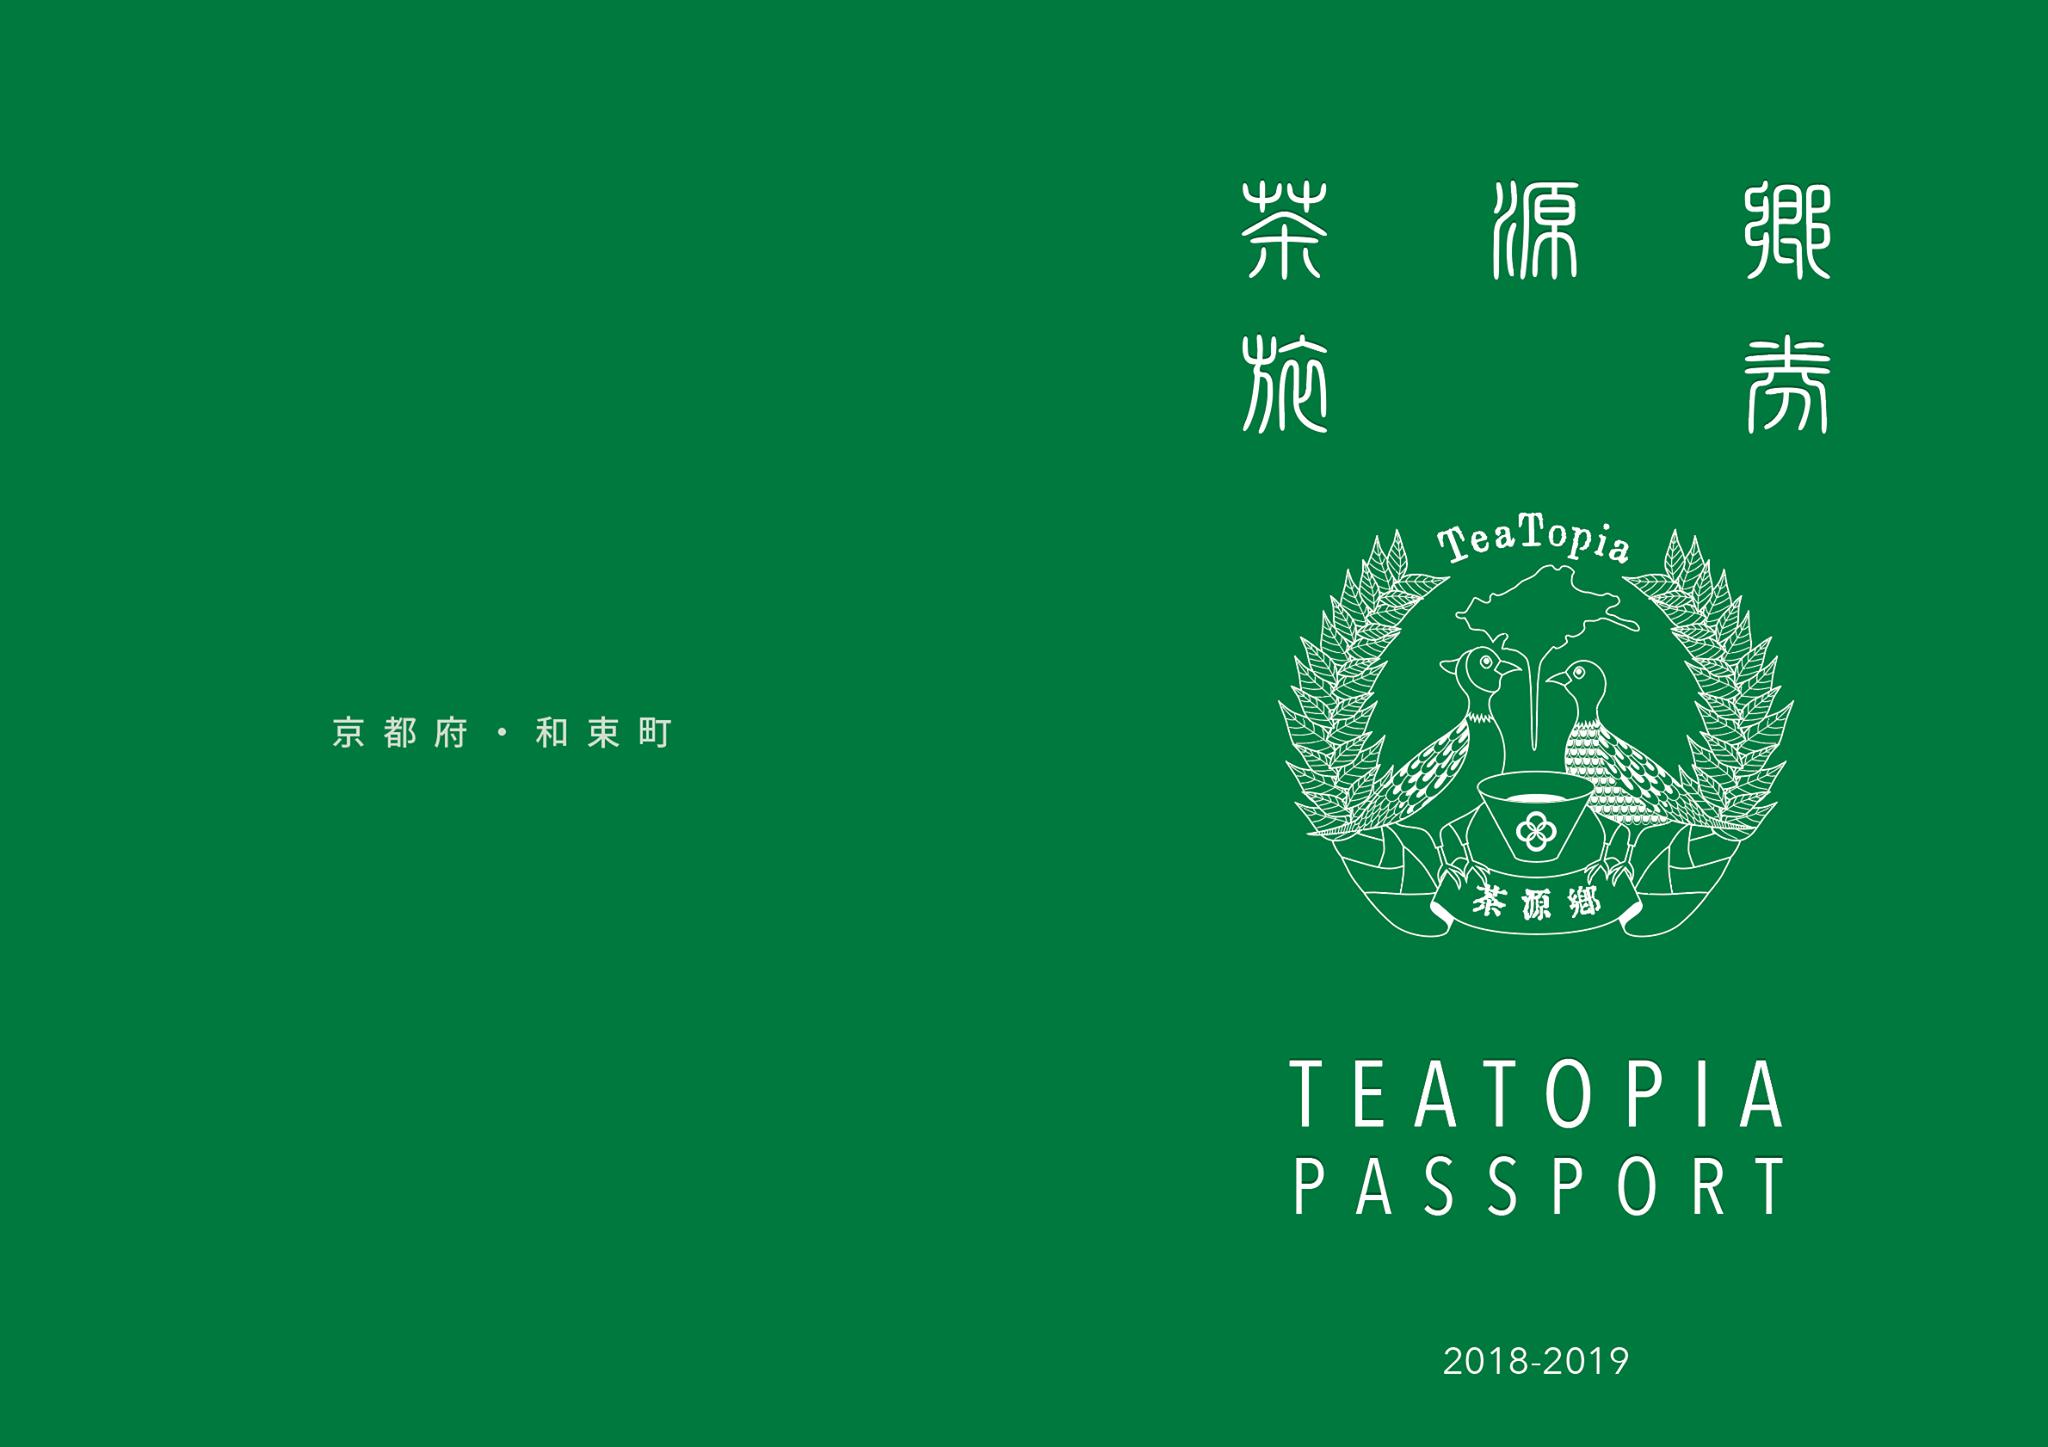 <!--:ja-->茶源郷まつりパスポート<!--:-->